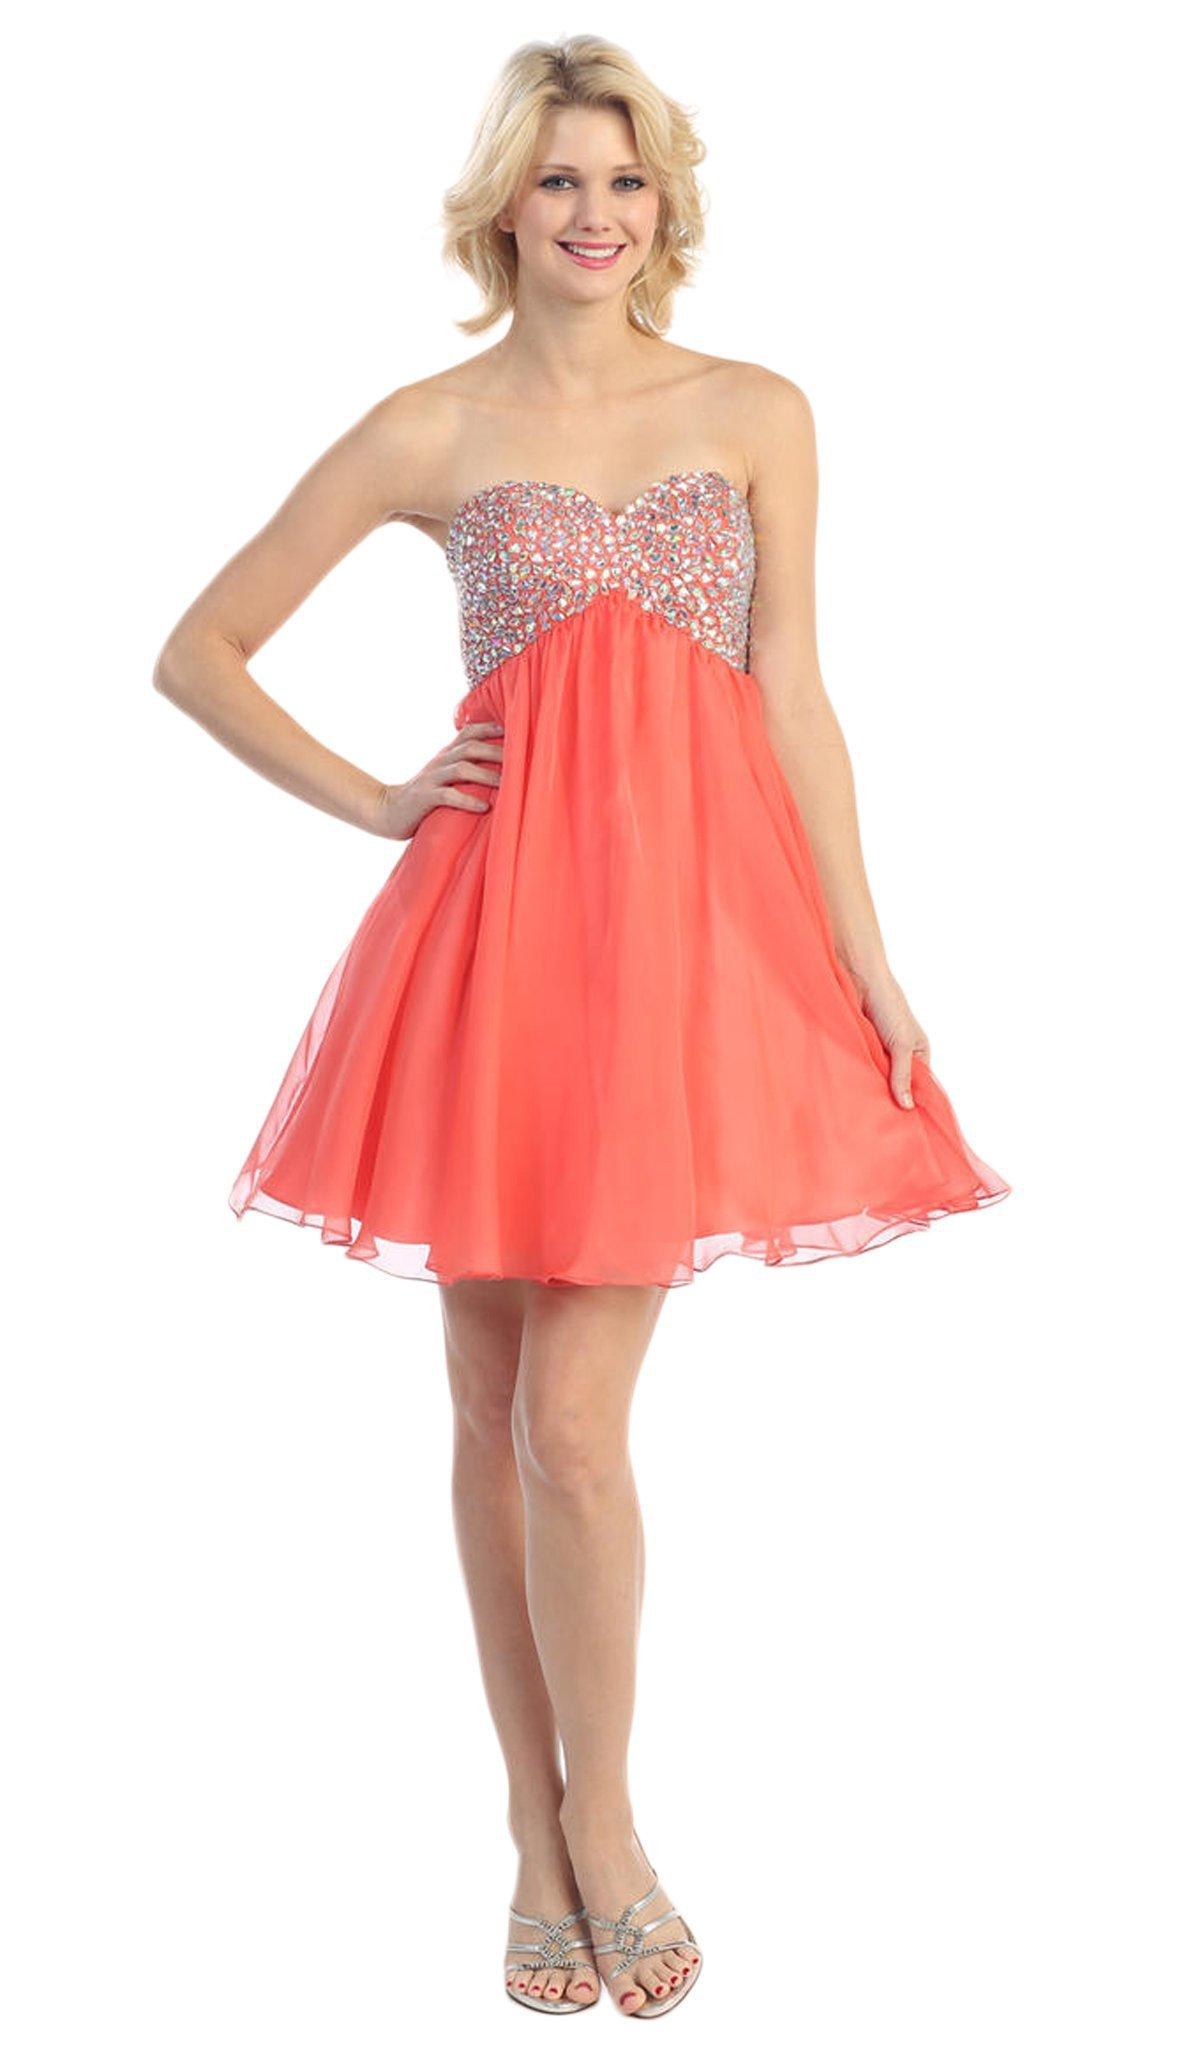 Eureka Fashion - 2301 Beaded Sweetheart Chiffon A-line Dress